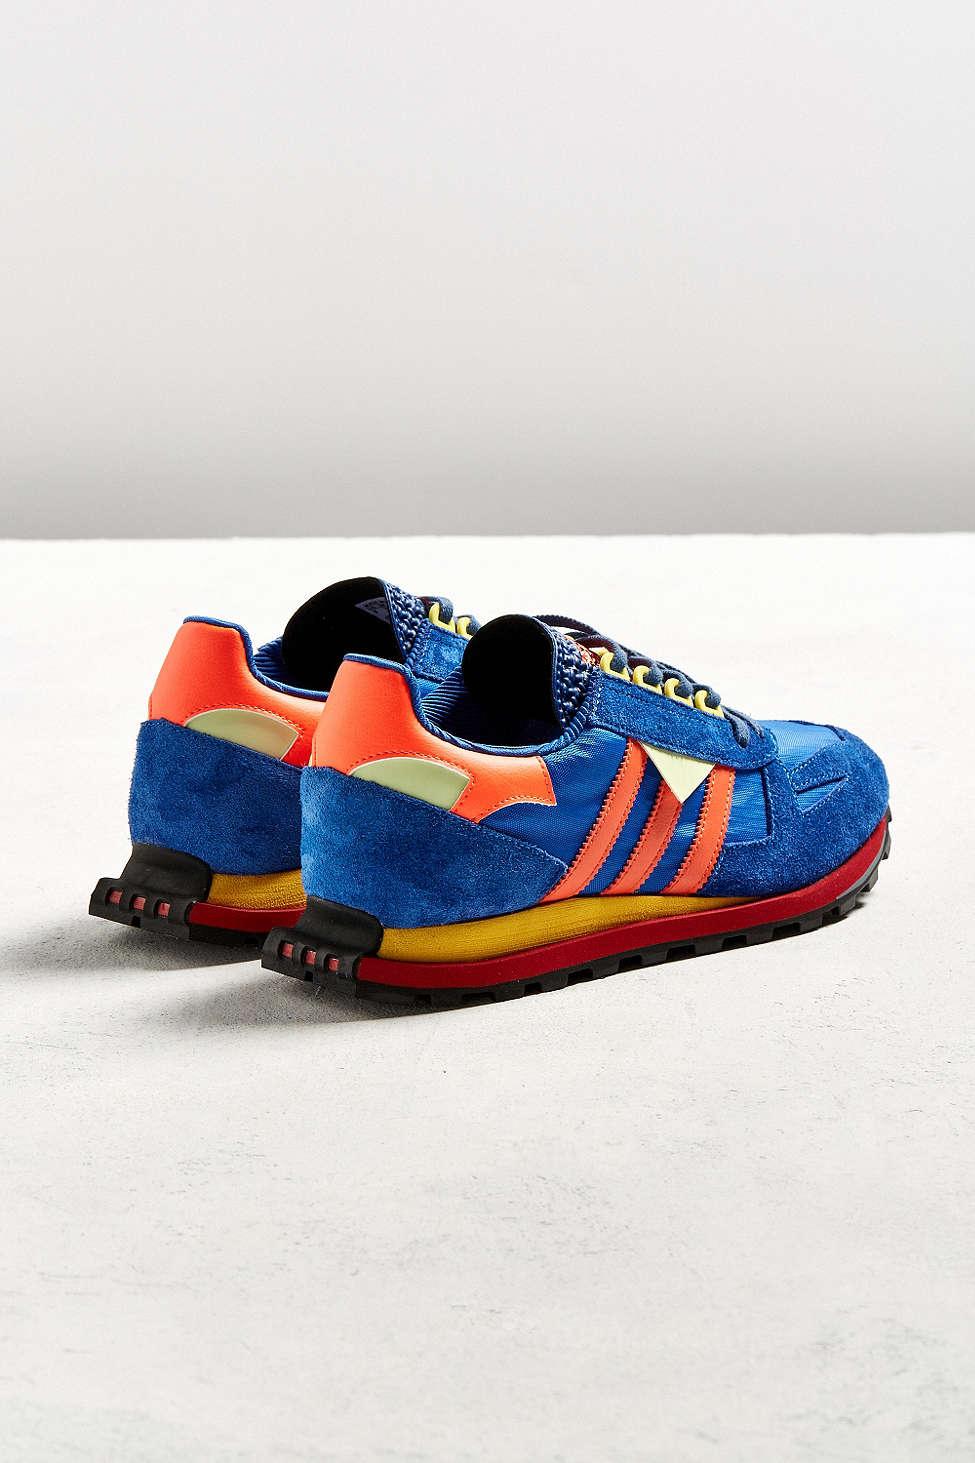 Adidas Auto Racing Shoes